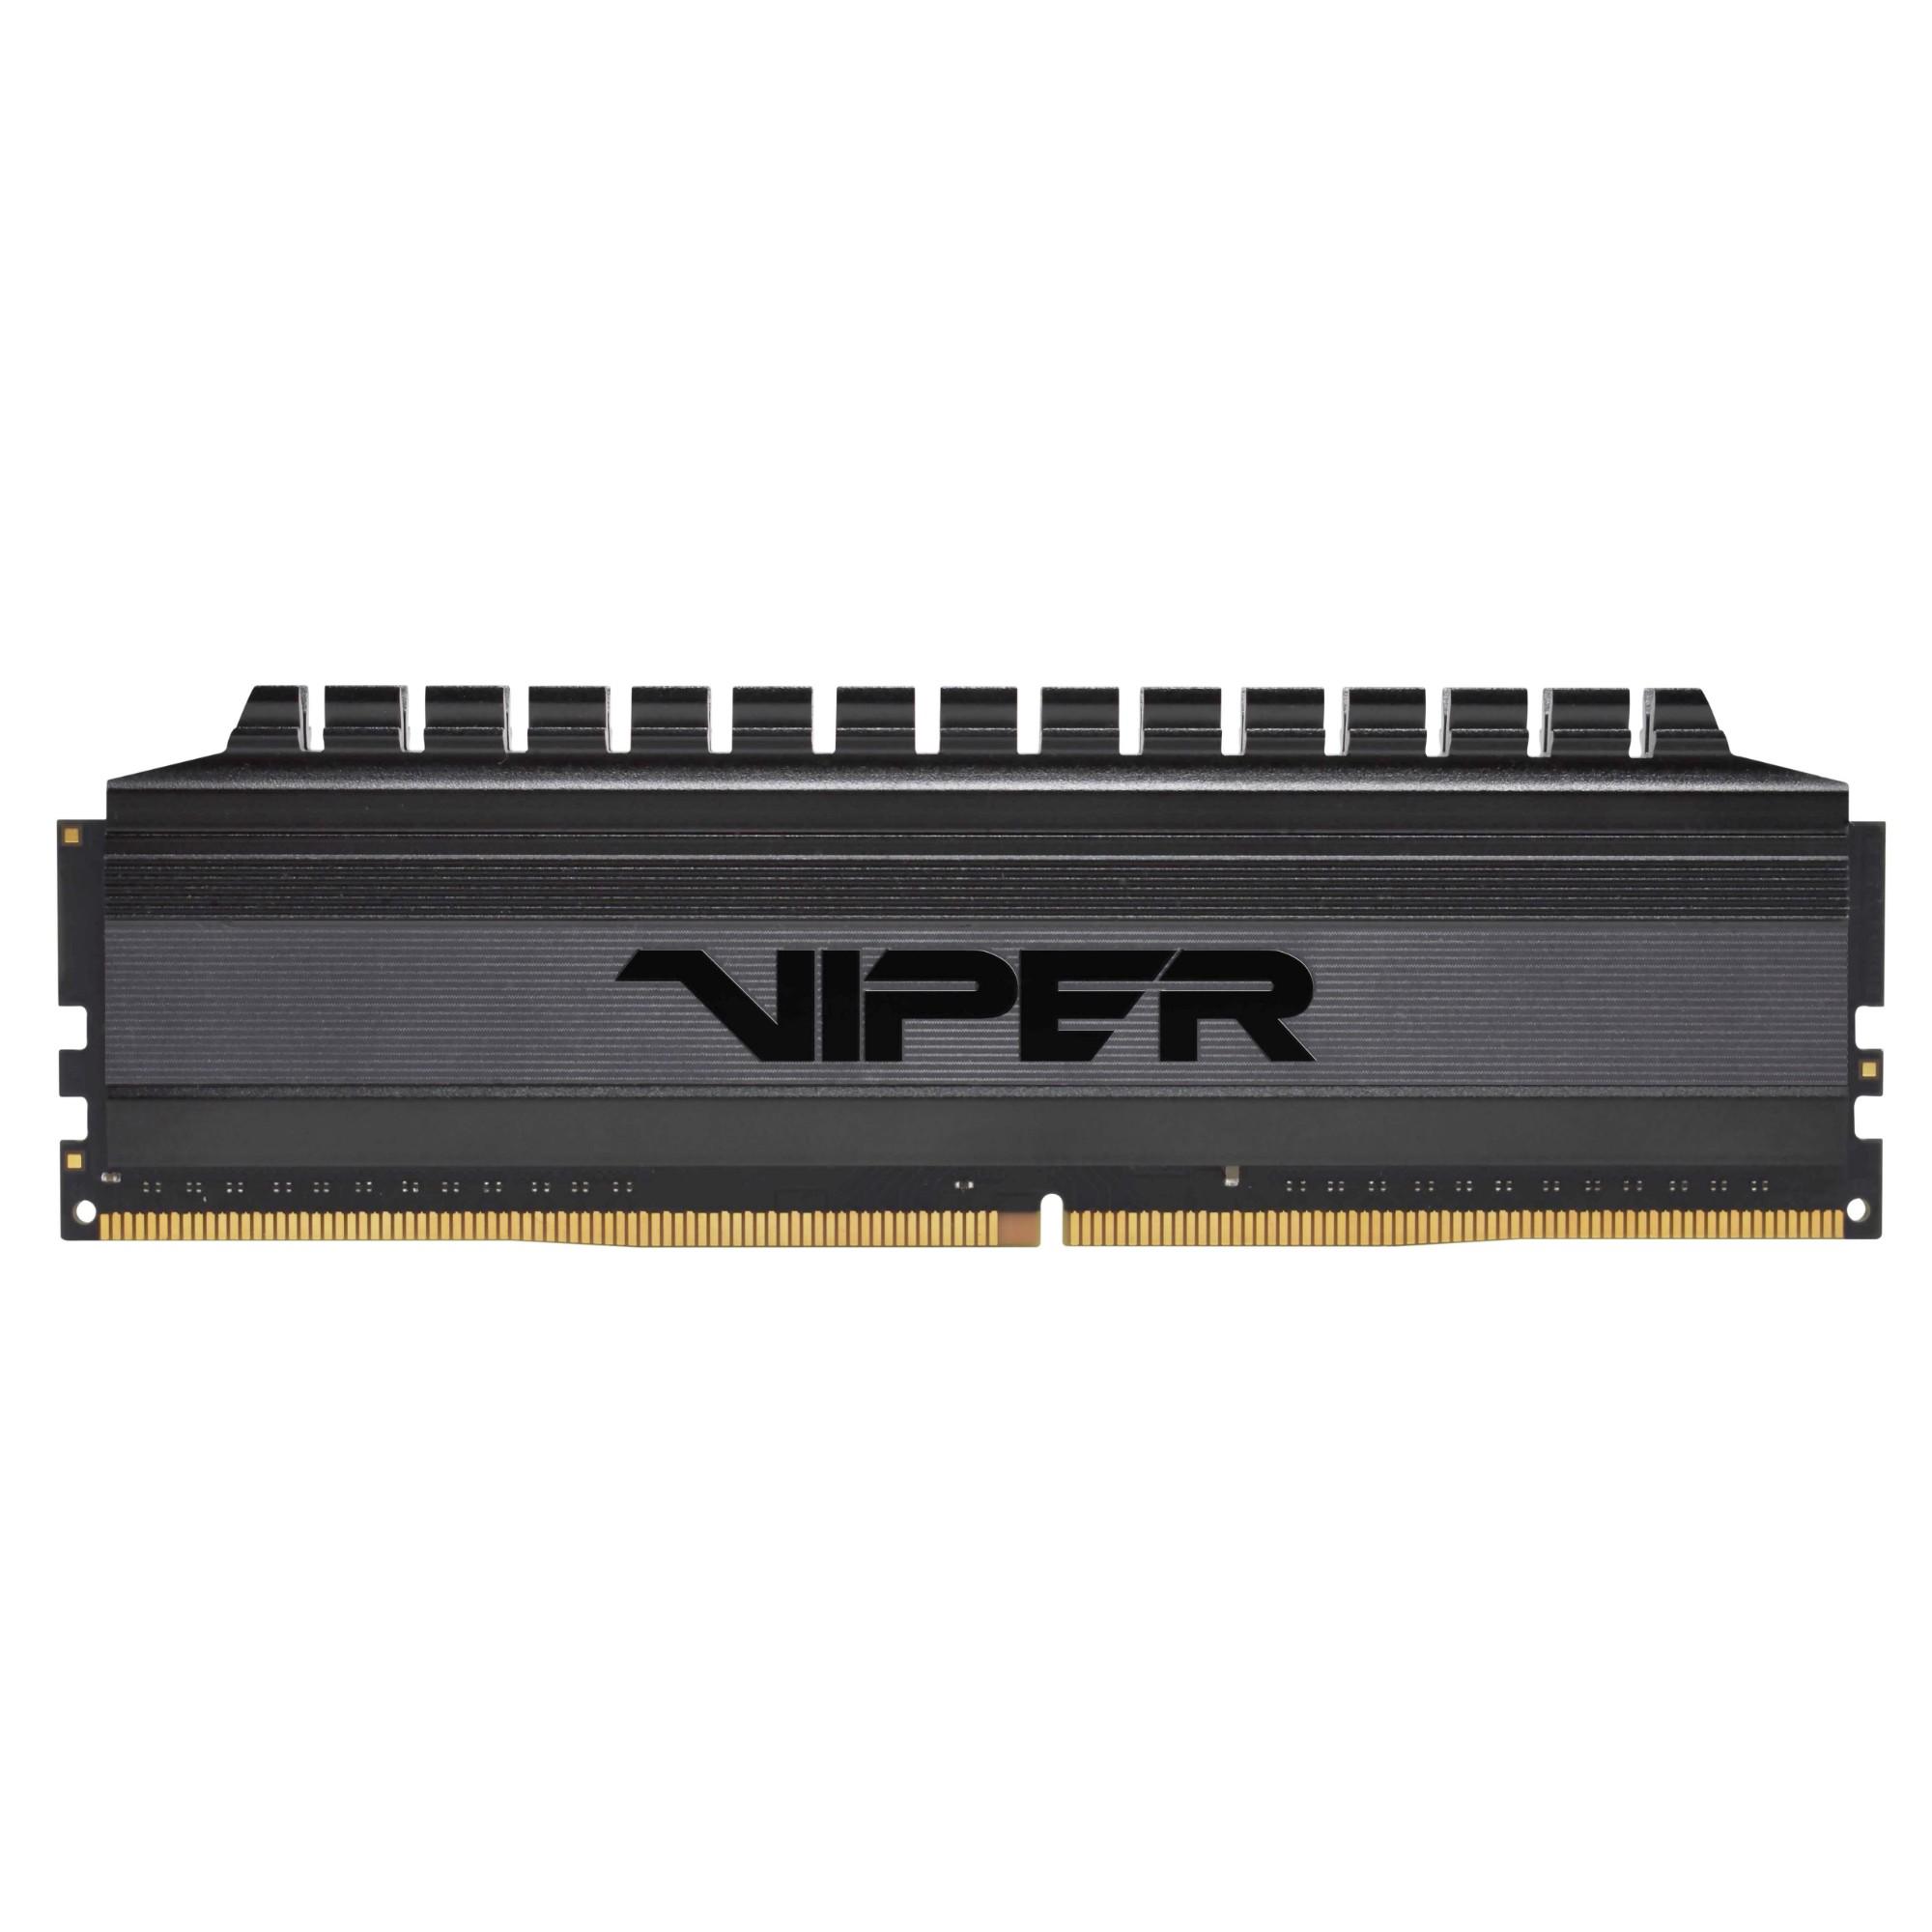 Patriot Memory Viper 4 PVB416G400C9K memory module 16 GB DDR4 4000 MHz